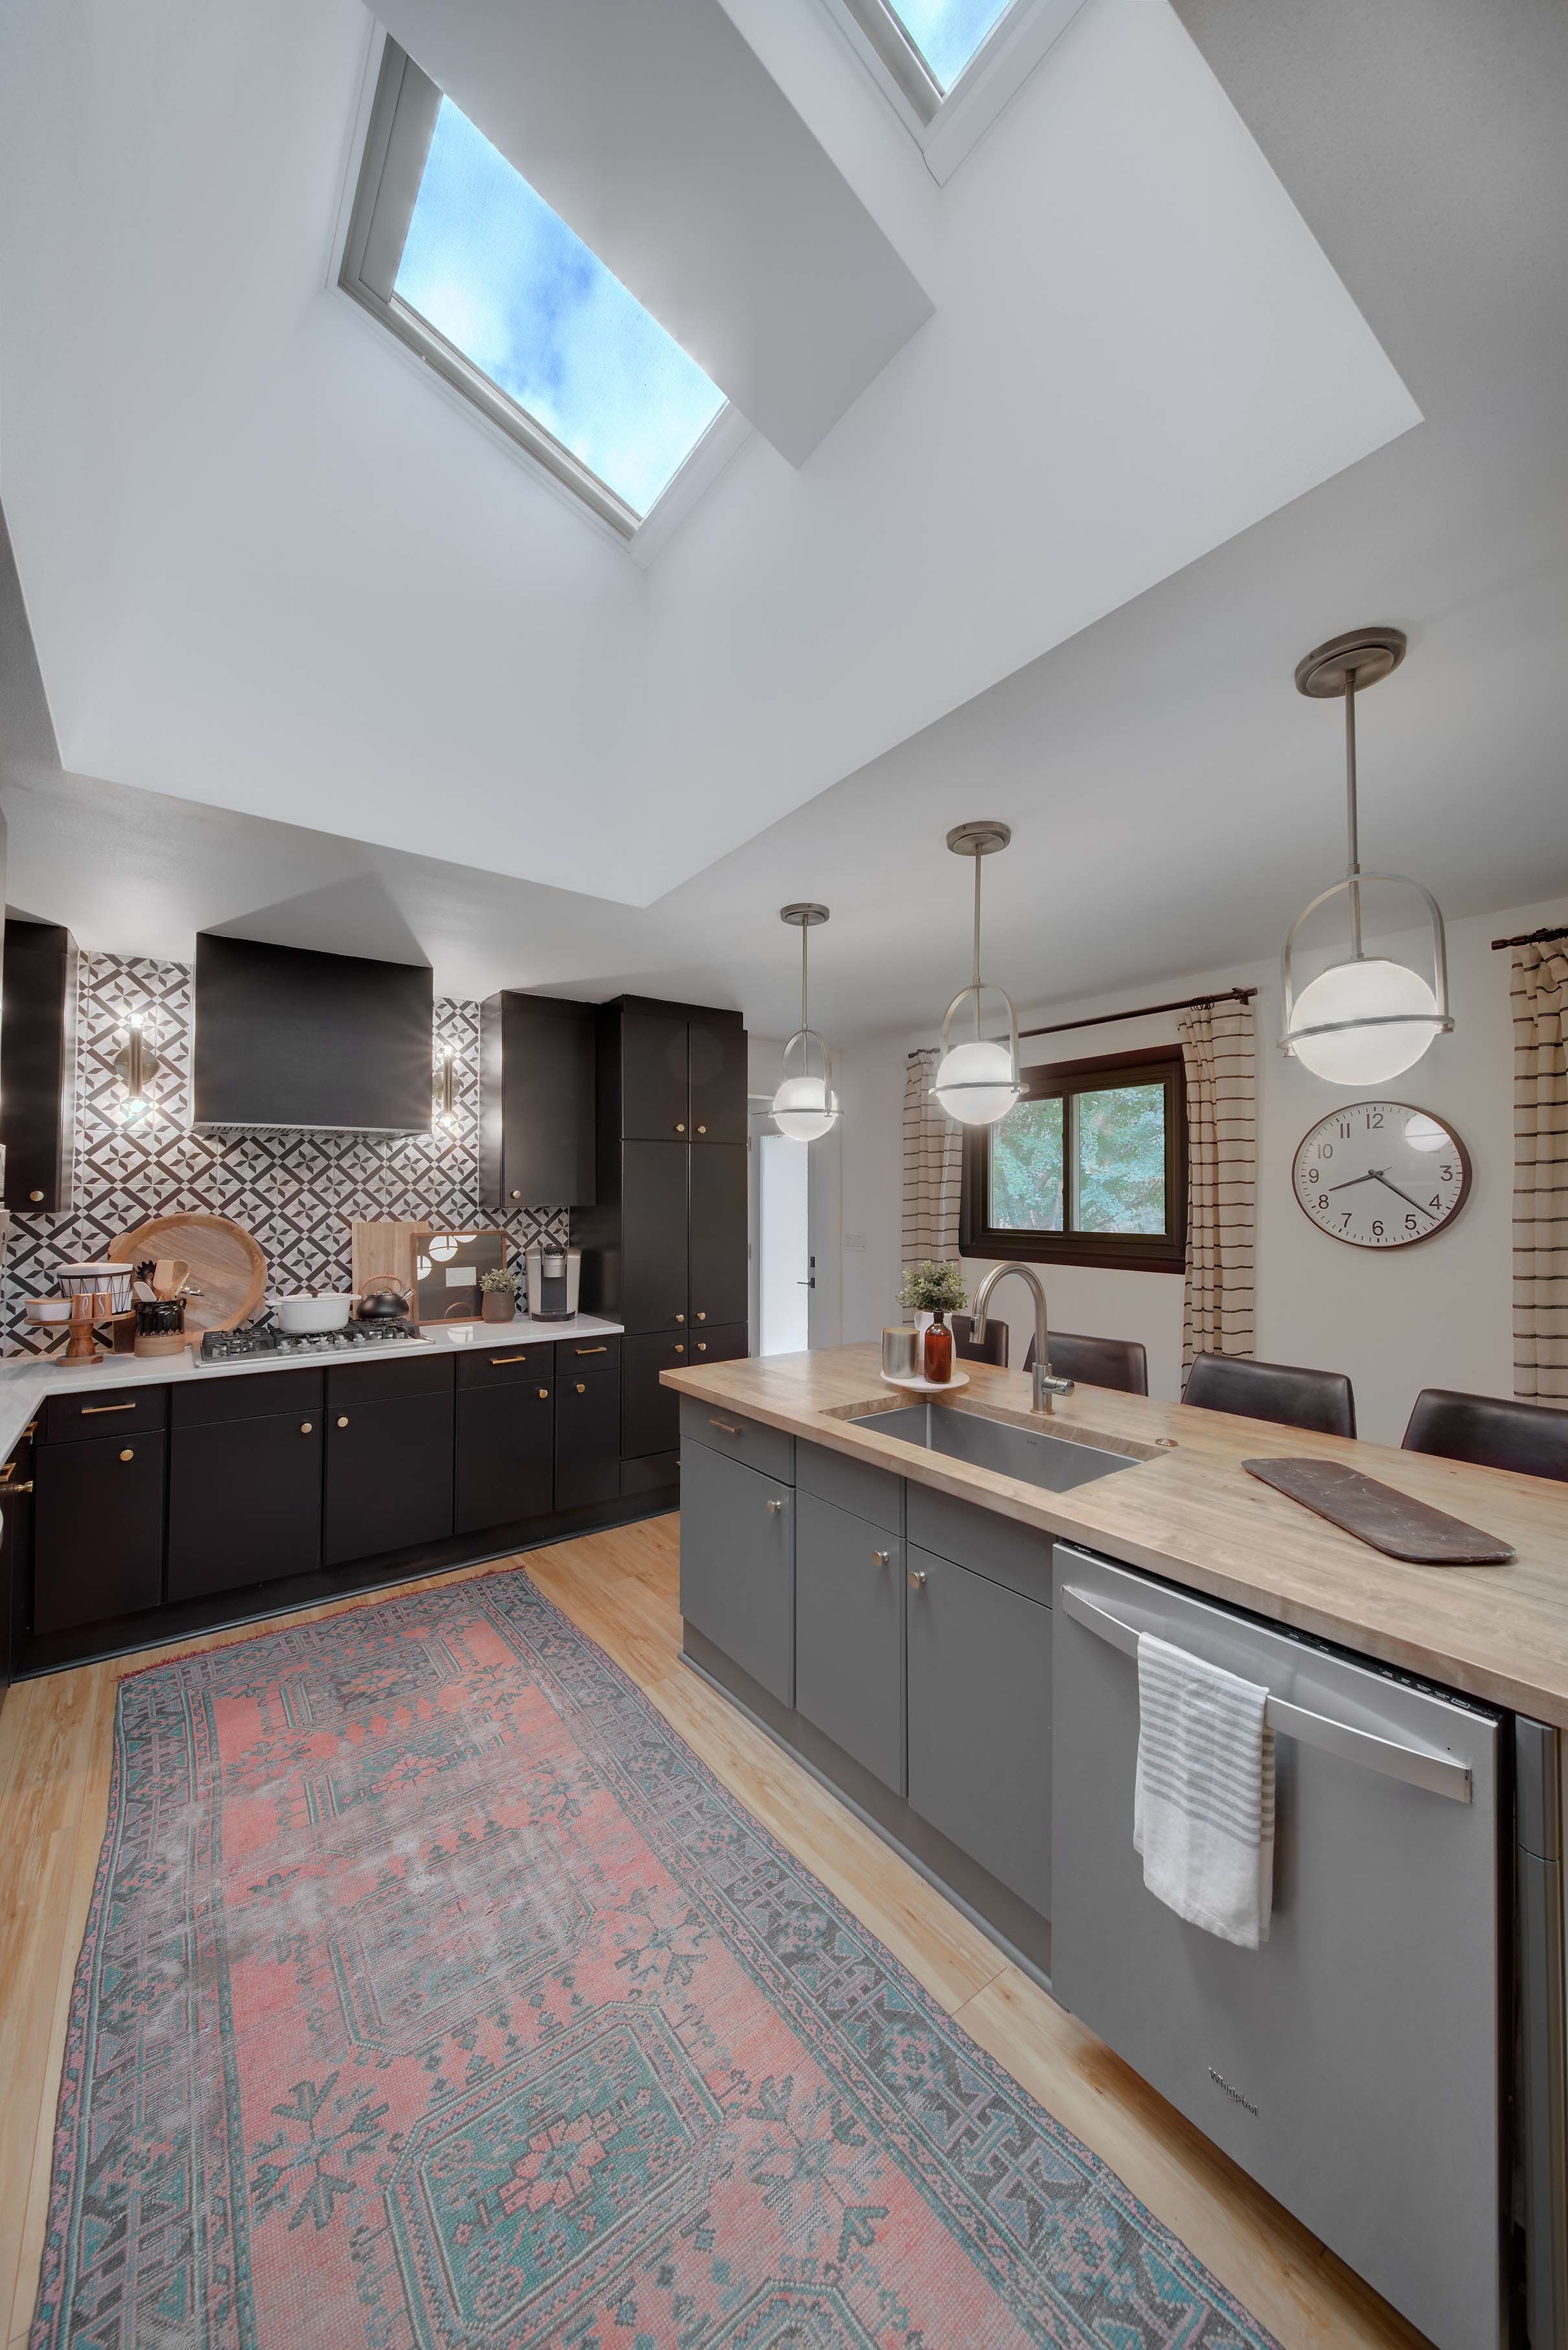 Kitchen antique rug skylights black cabinets